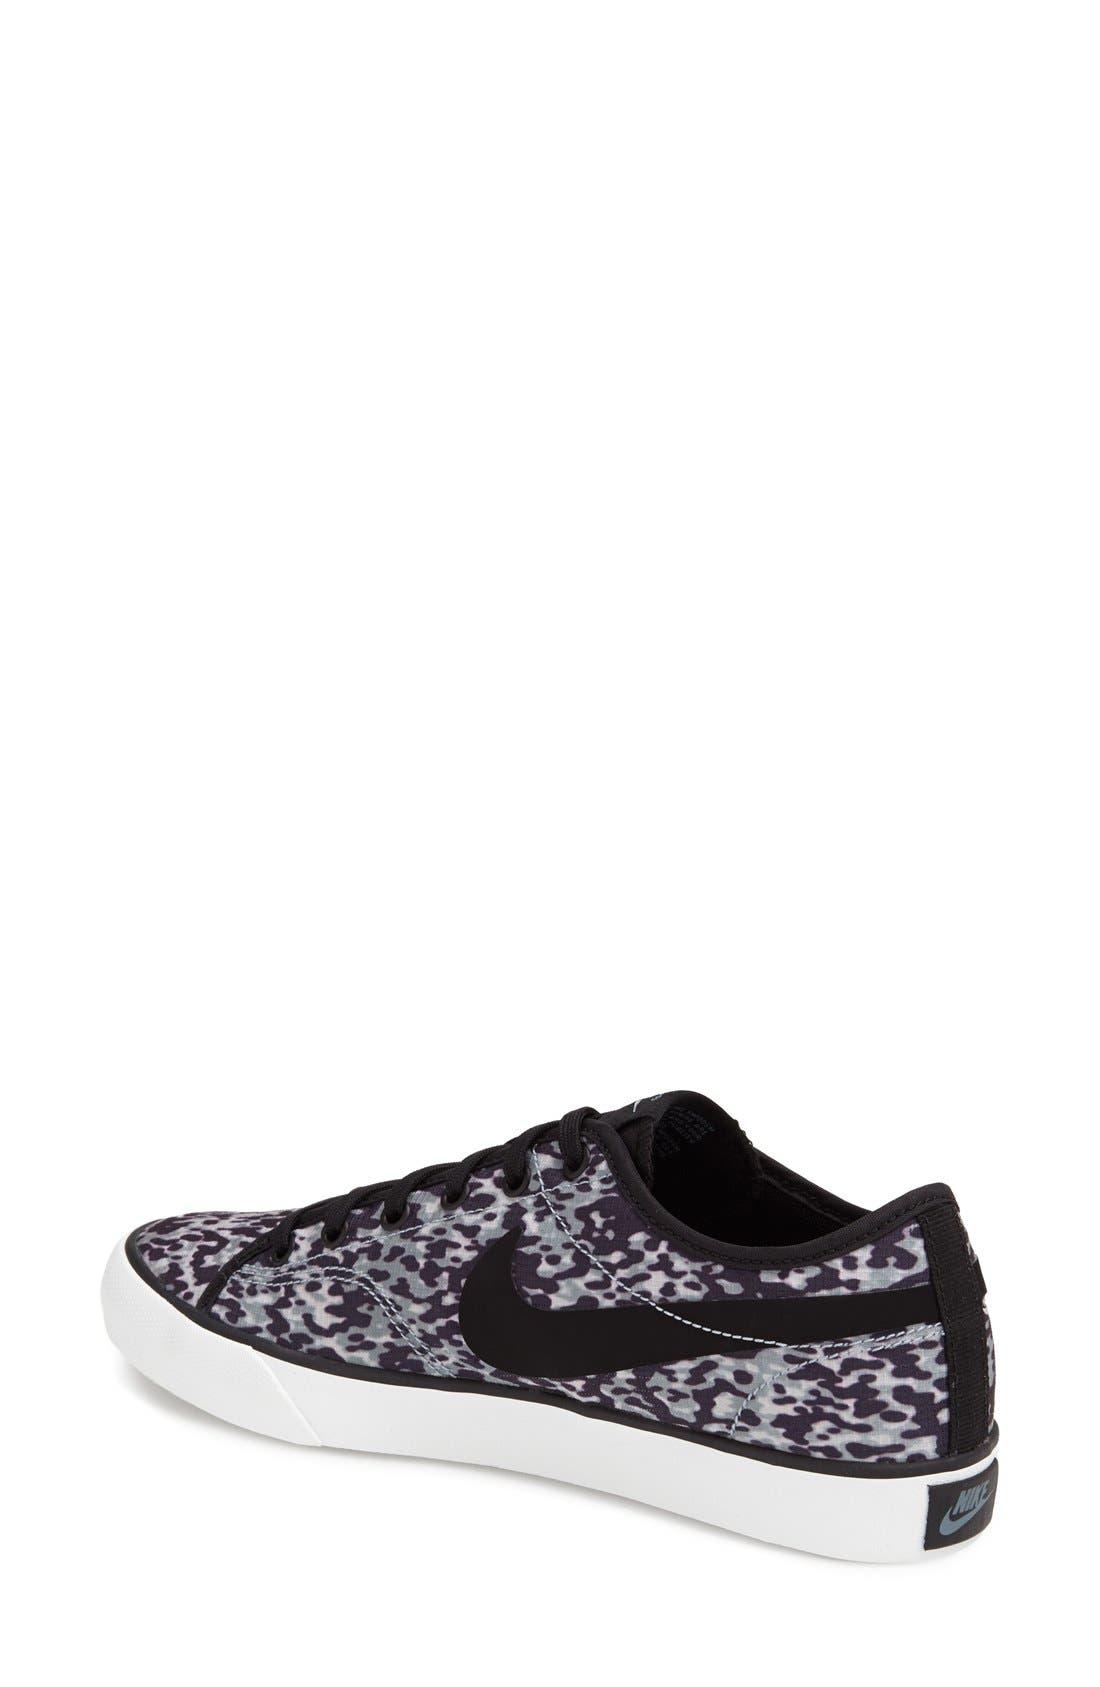 Alternate Image 2  - Nike 'Primo - Court' Printed Canvas Sneaker (Women)